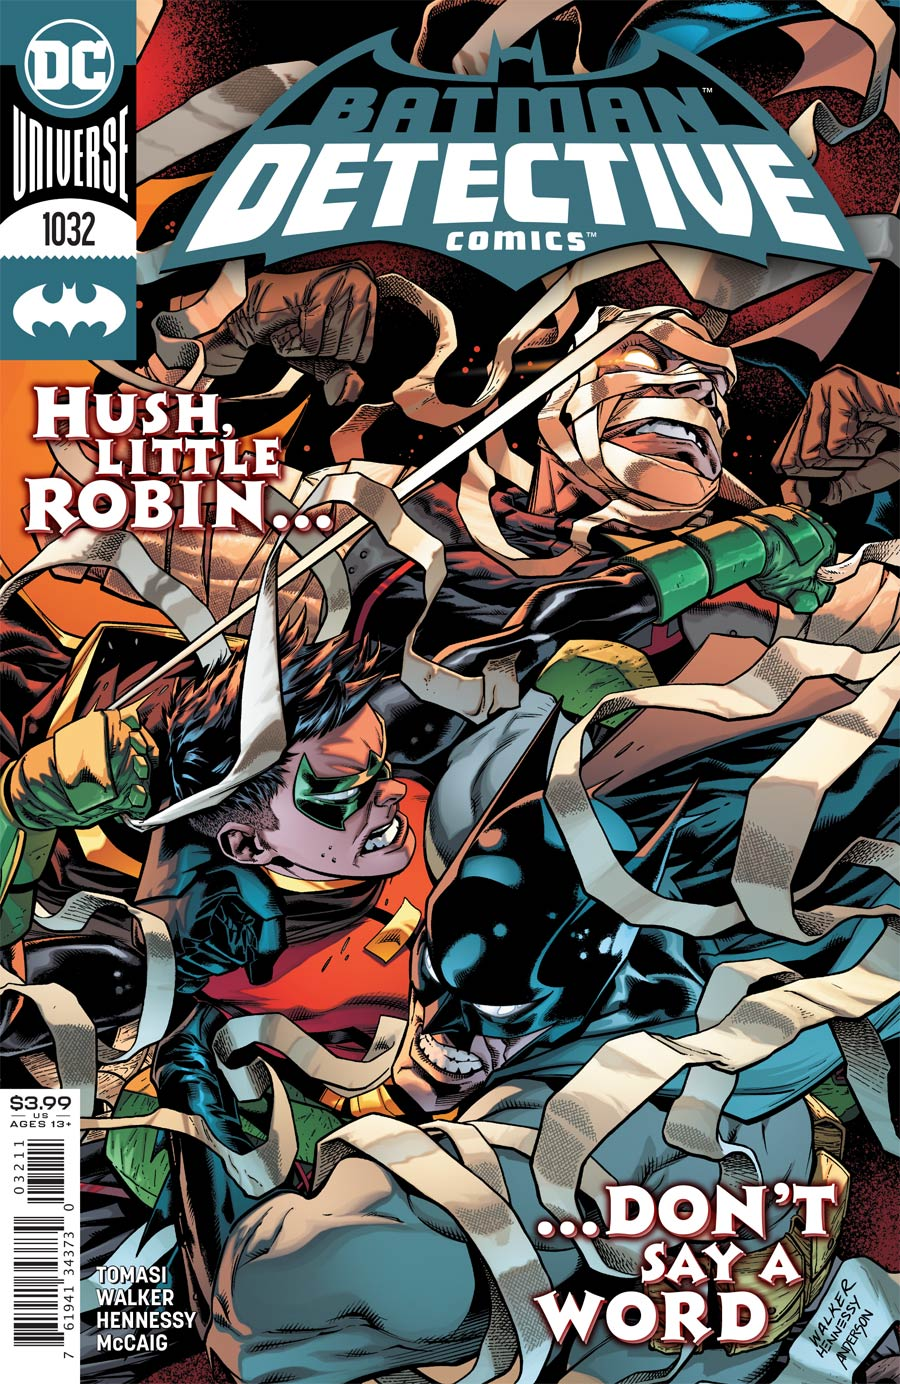 Detective Comics Vol 2 #1032 Cover A Regular Brad Walker & Andrew Hennessy Cover